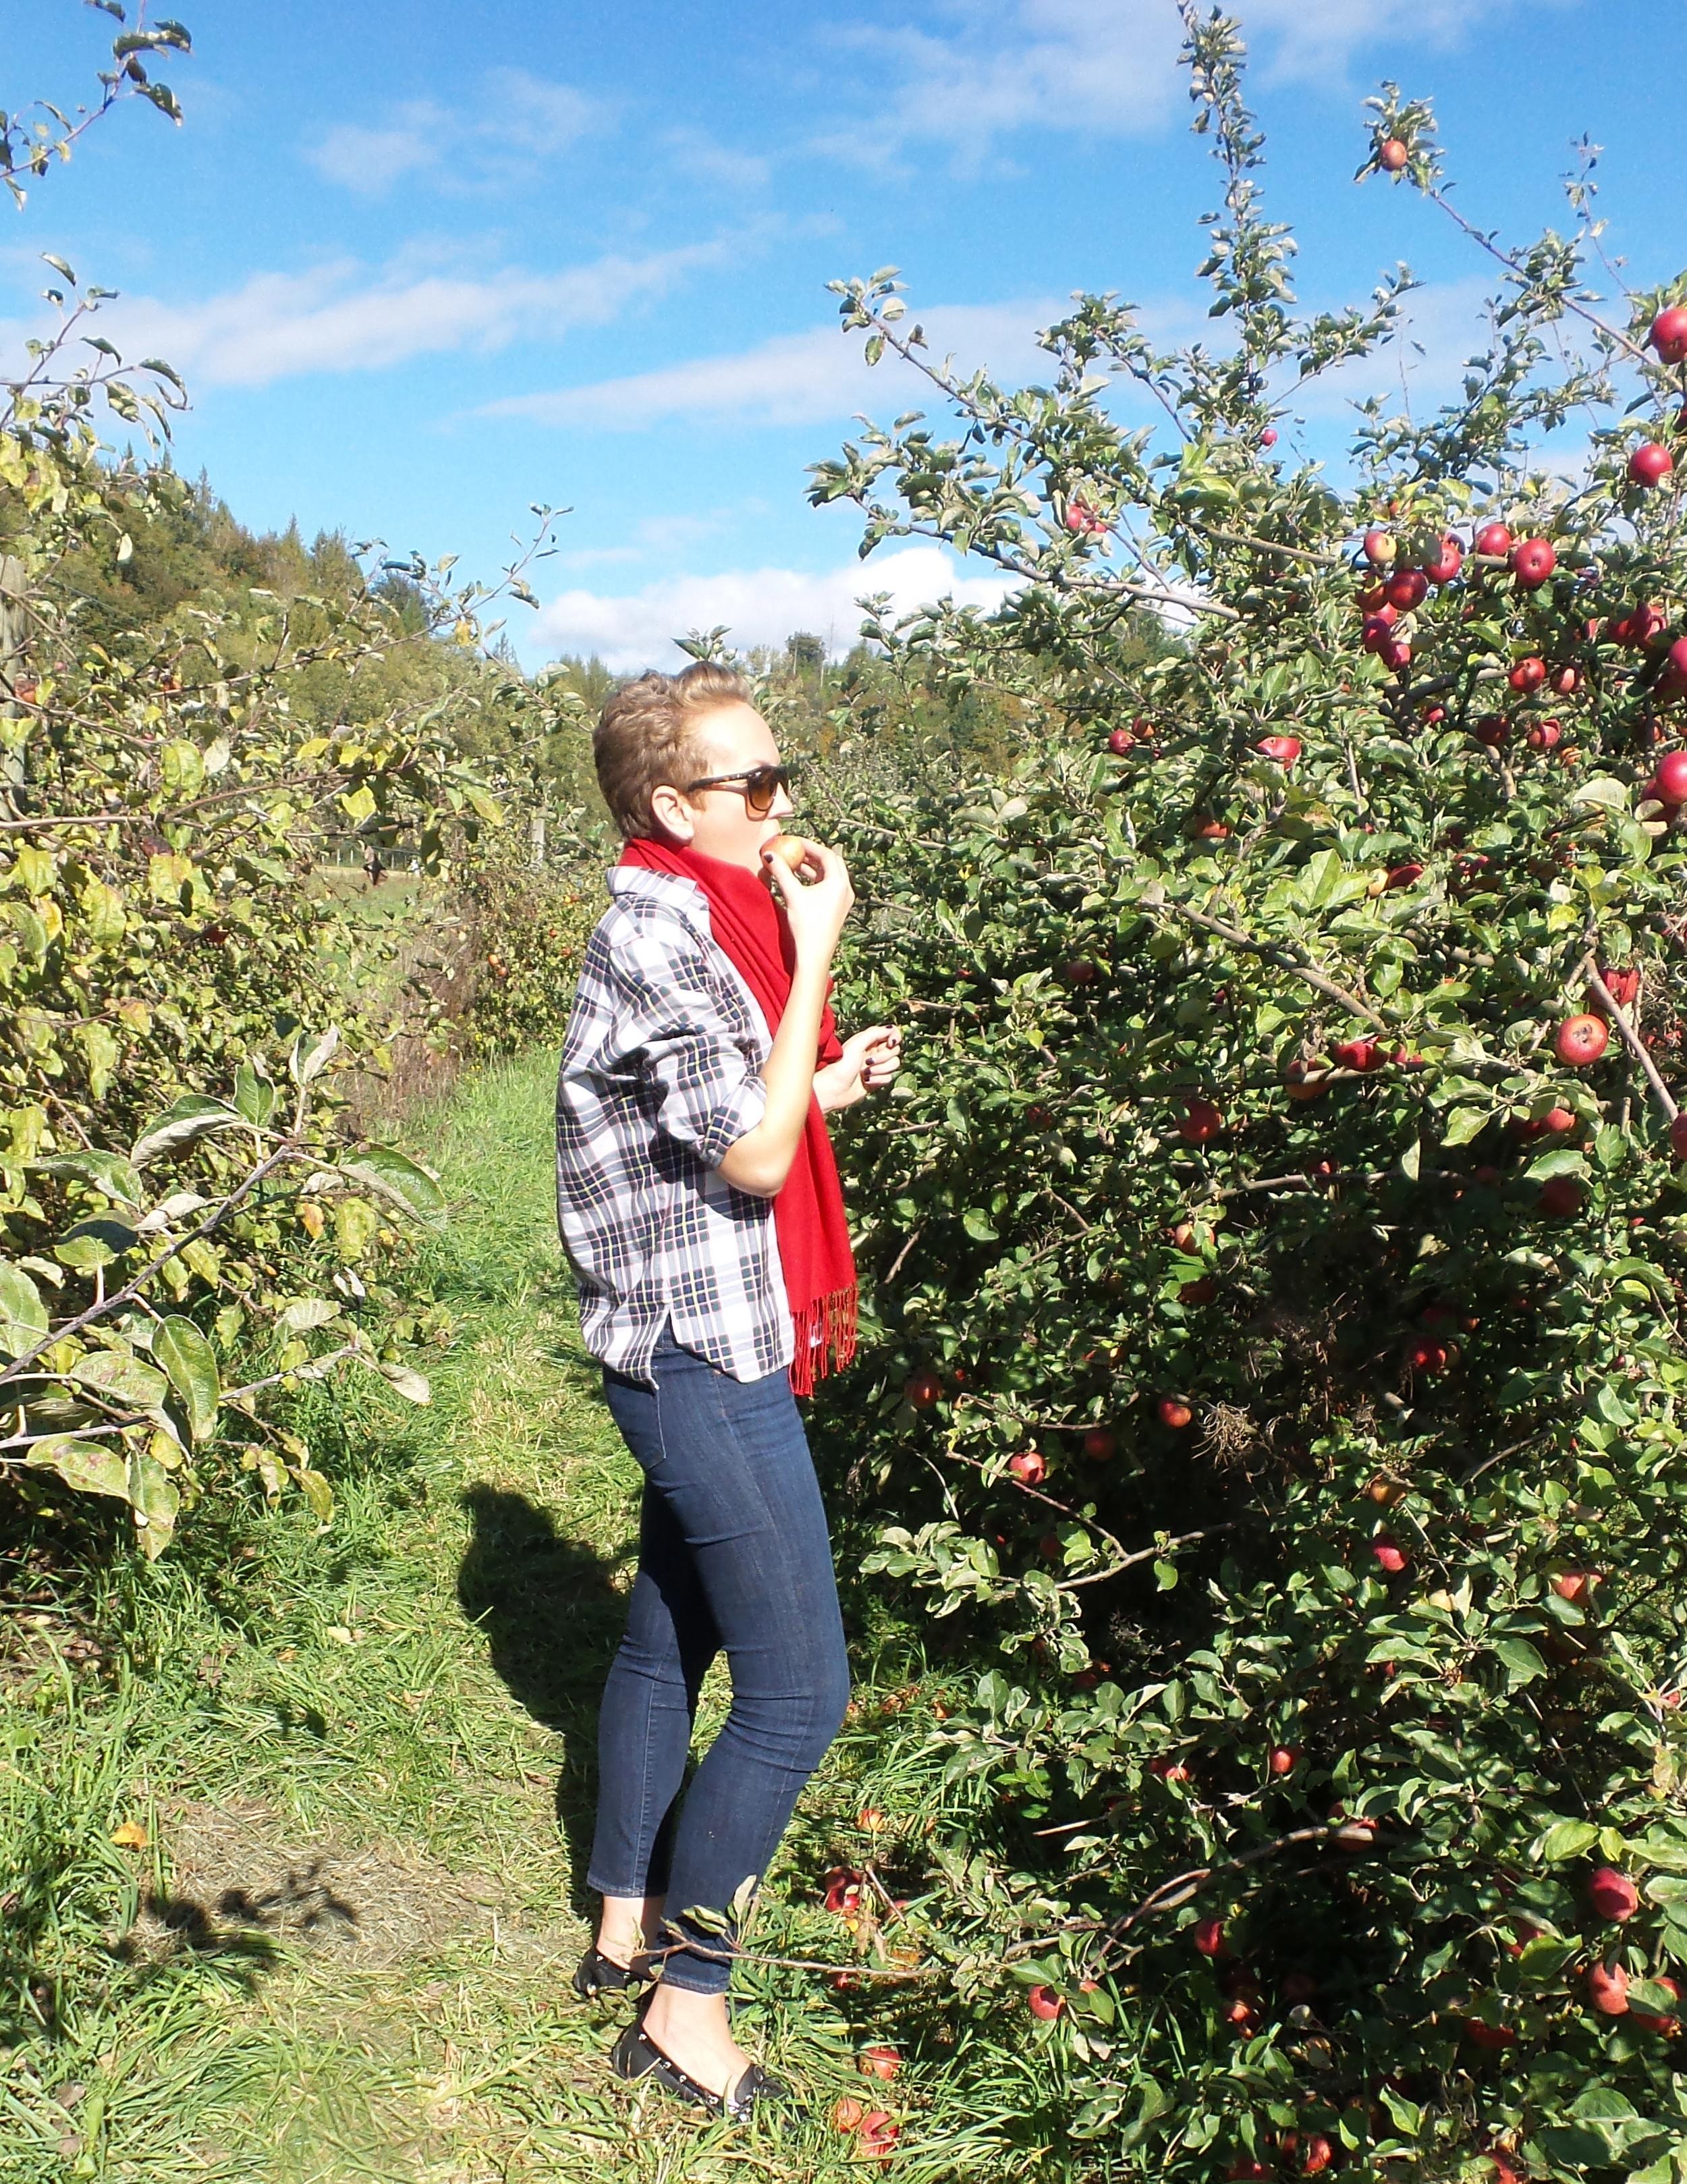 Picking apples at Jones Creek Farm in Sedro Woolley, Washington